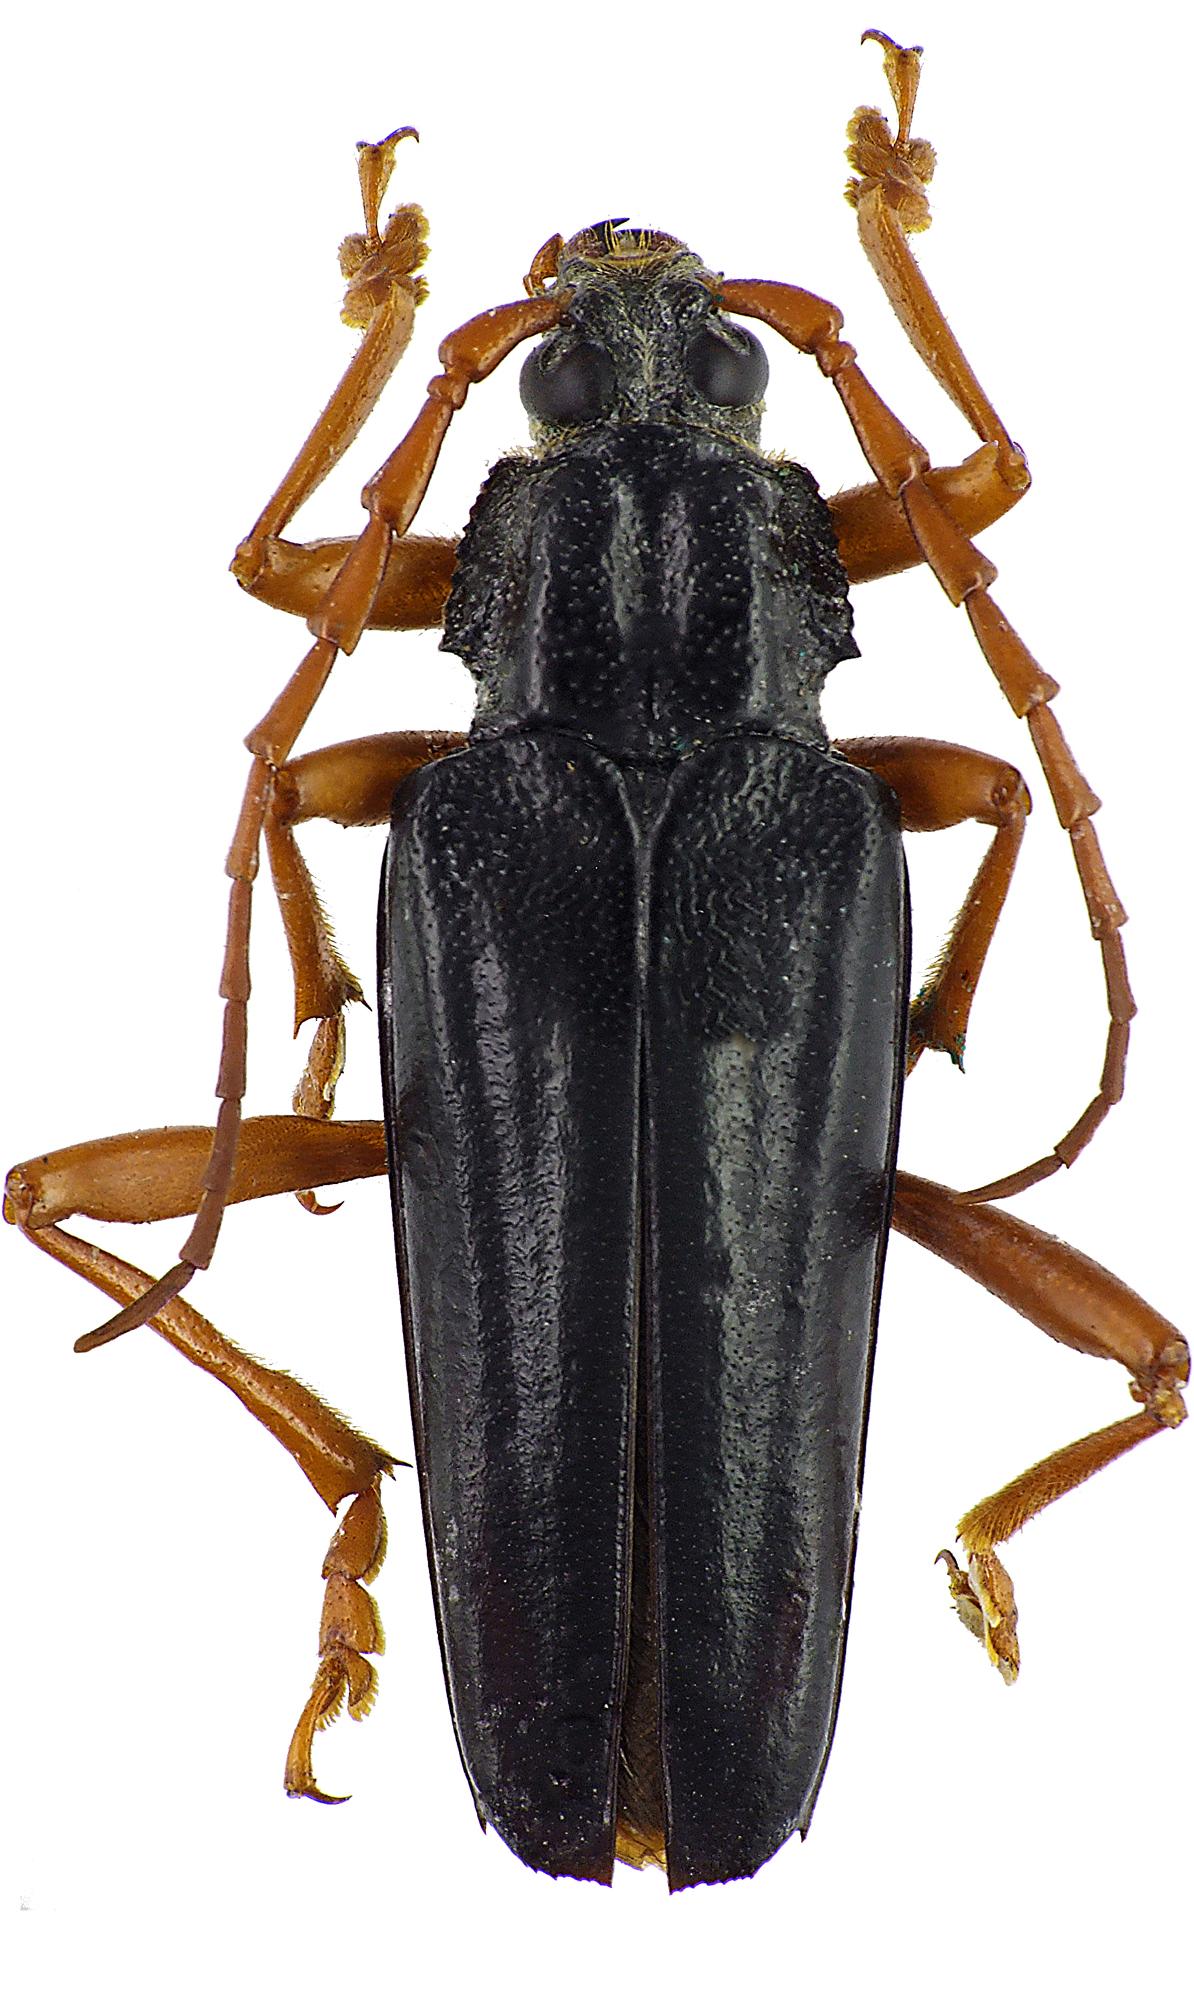 Elateropsis lineatus 46981cz85.jpg